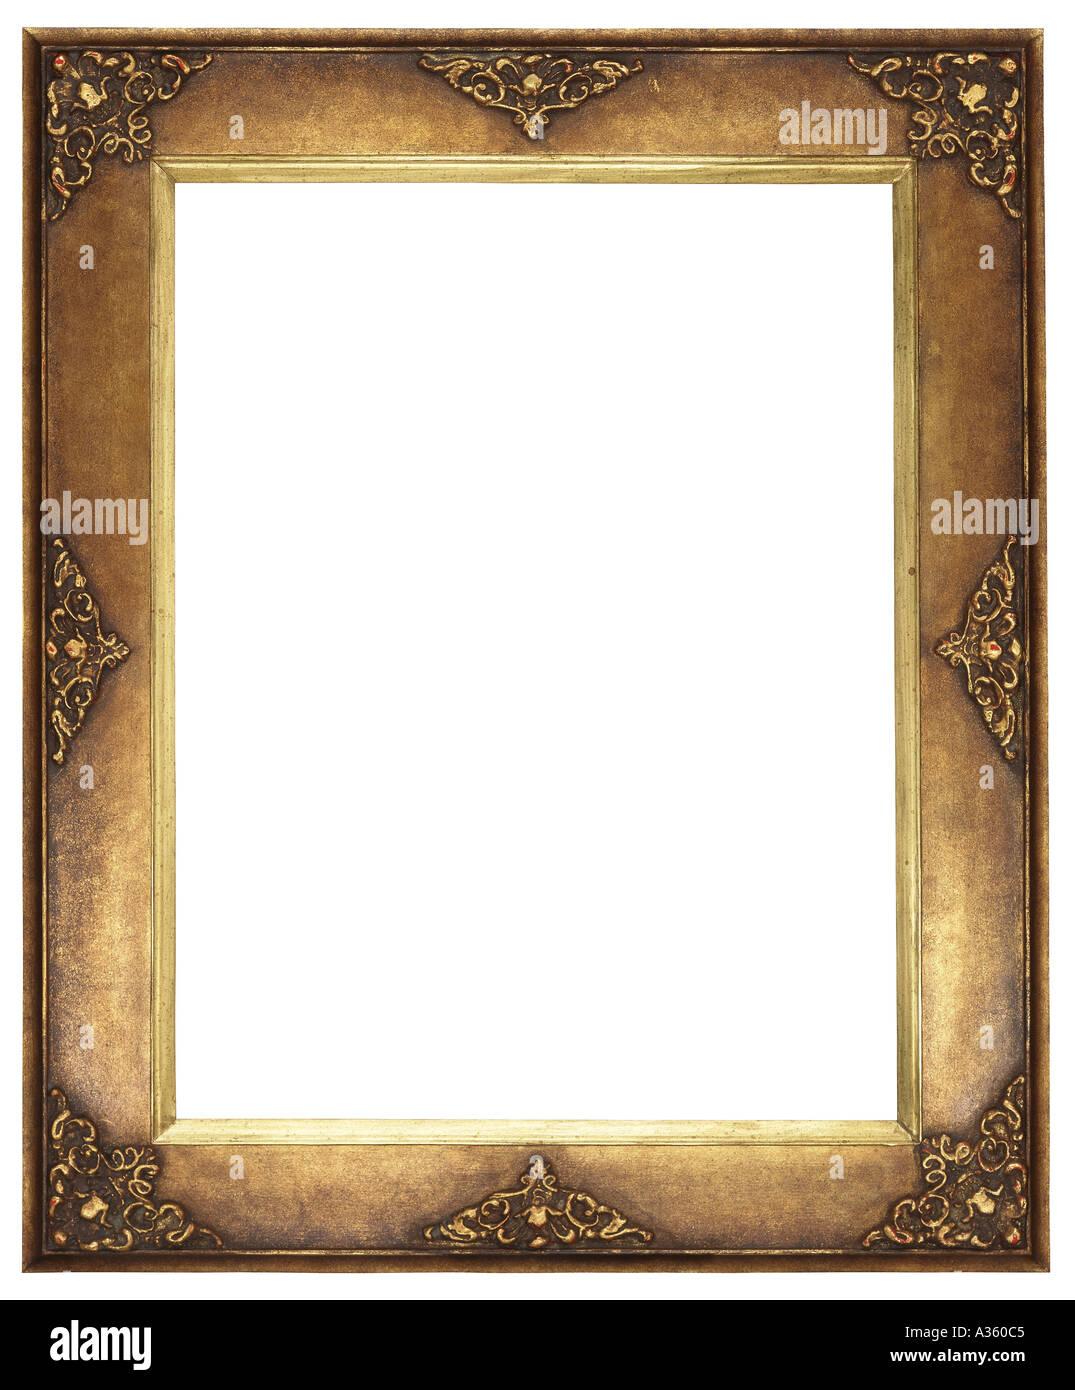 A vertical gold gilded rectangular decorative ornate antique frame ...